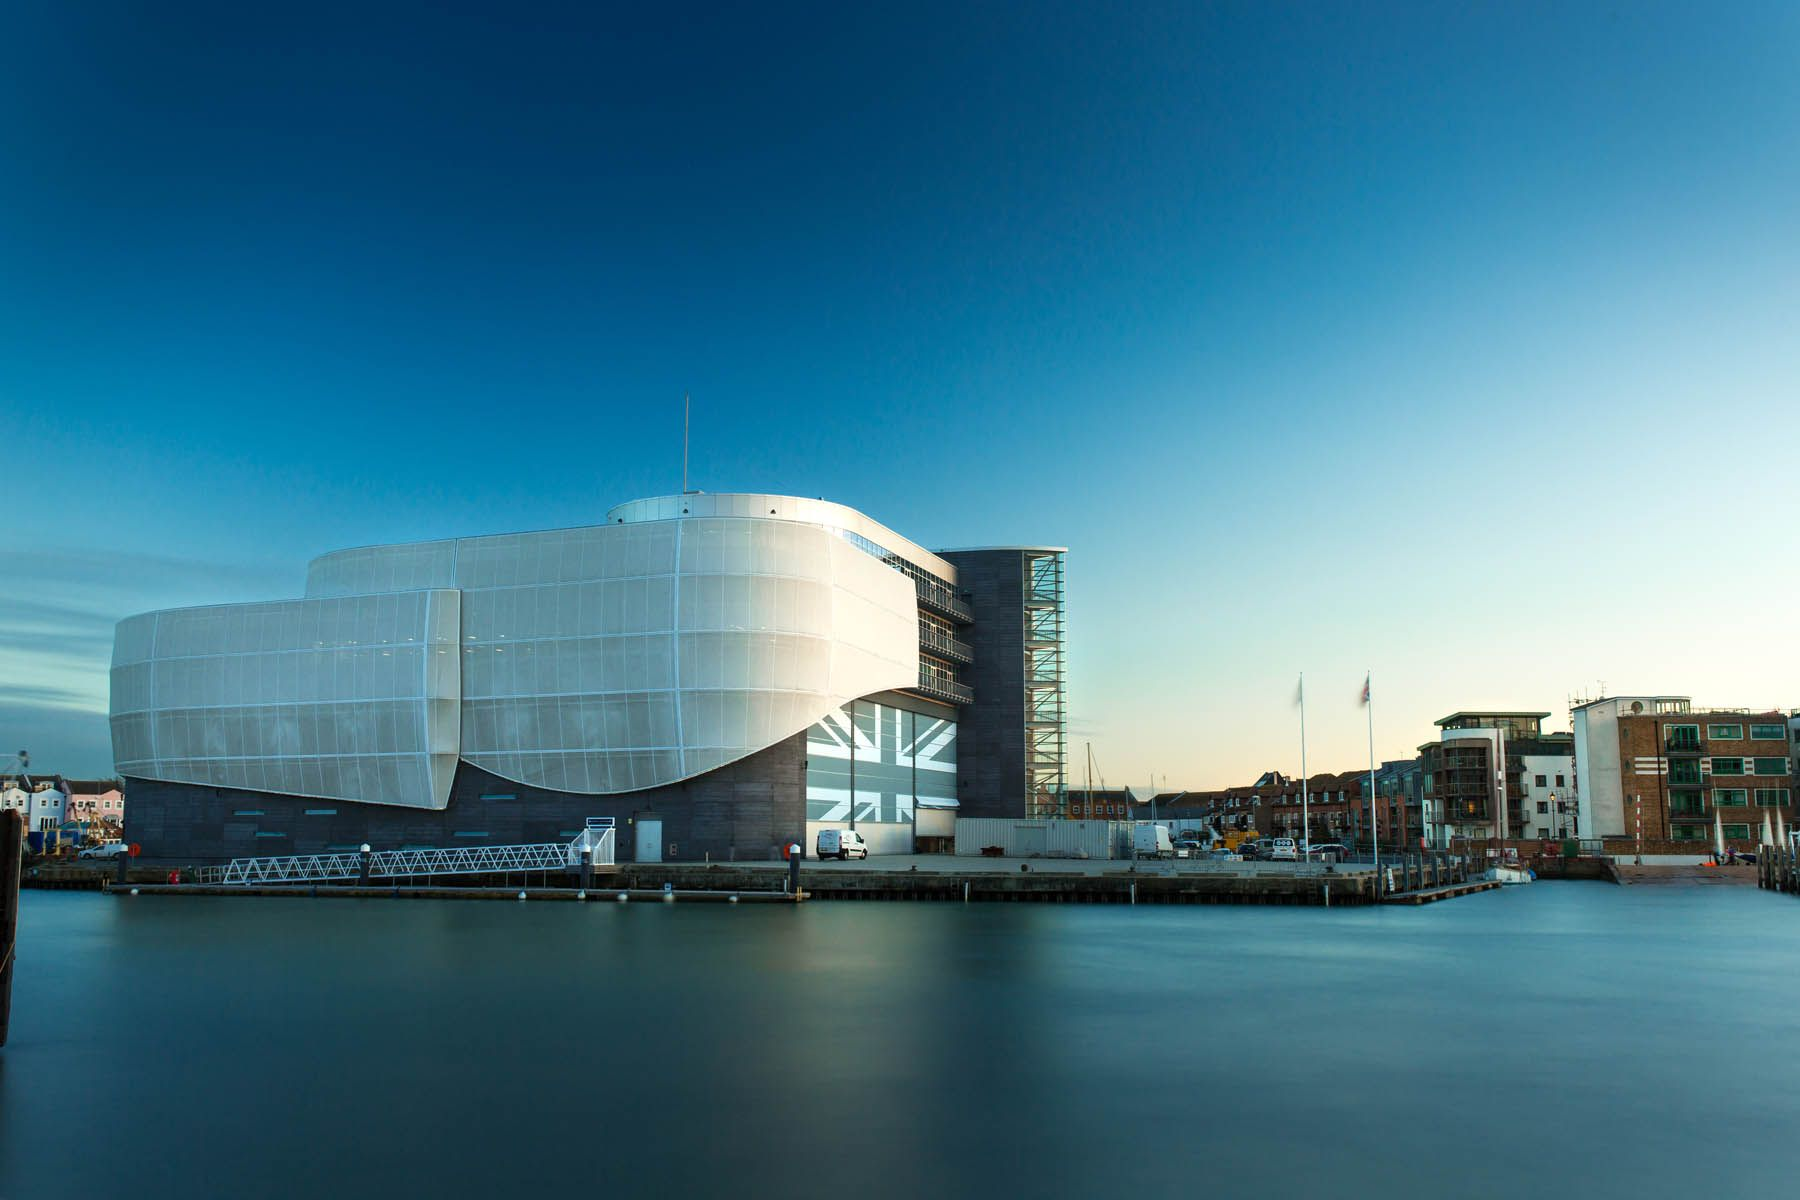 Sir-Ben-Ainslie-Sailing-Centre-Portsmouth-5